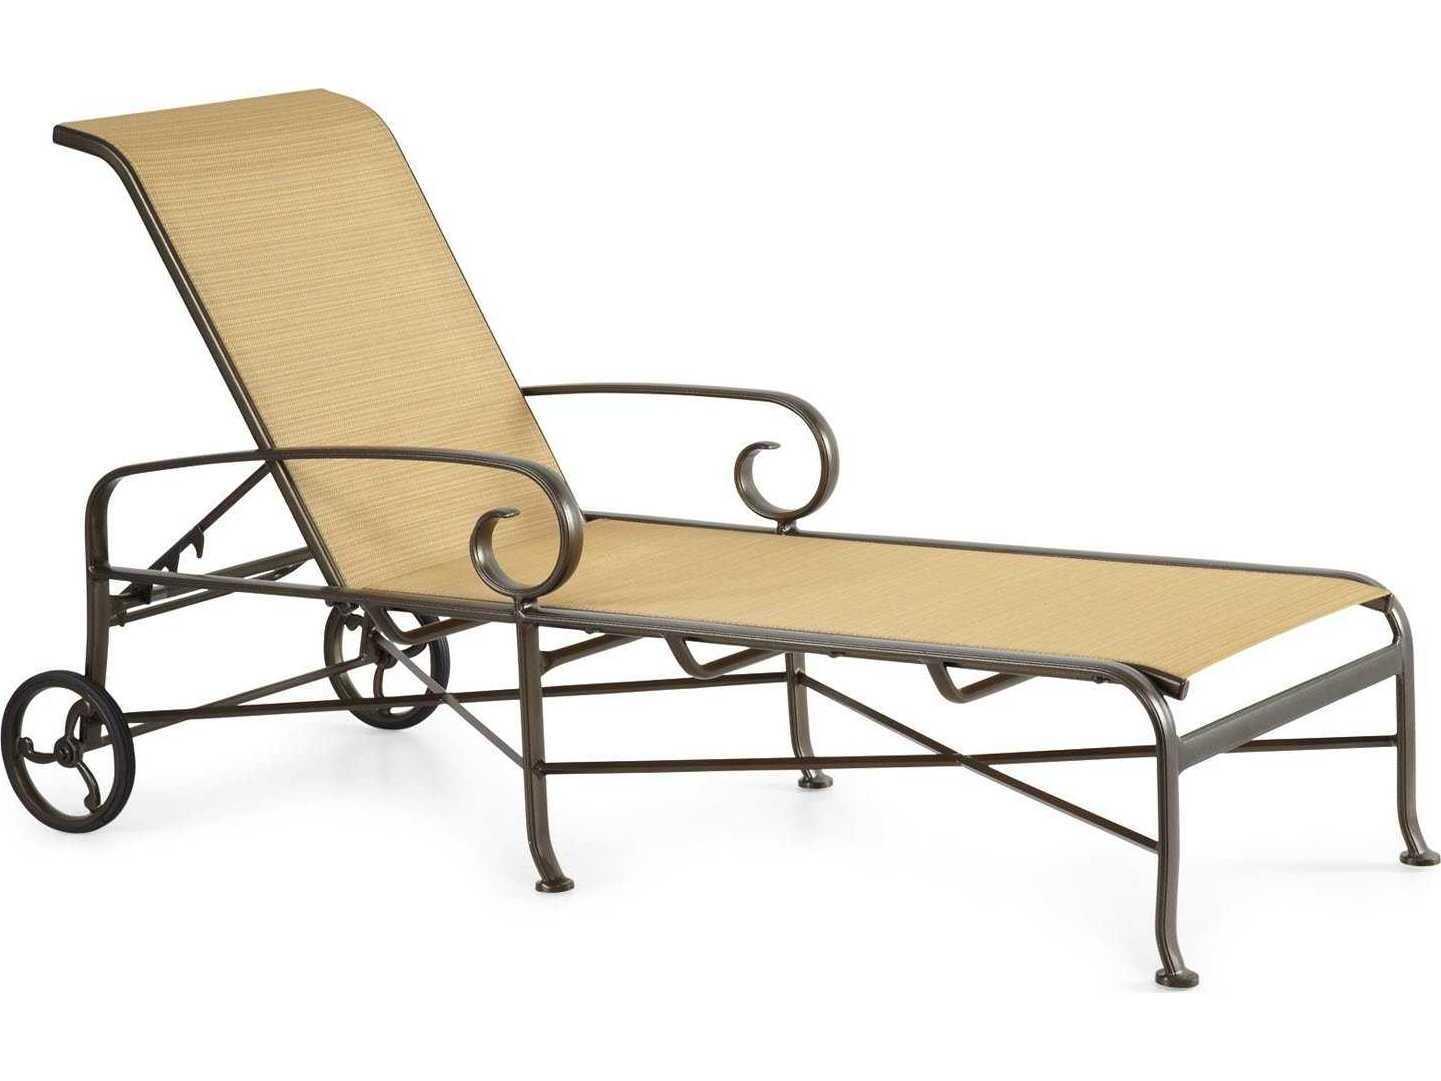 Winston Veneto Sling Cast Aluminum Arm Chaise Lounge